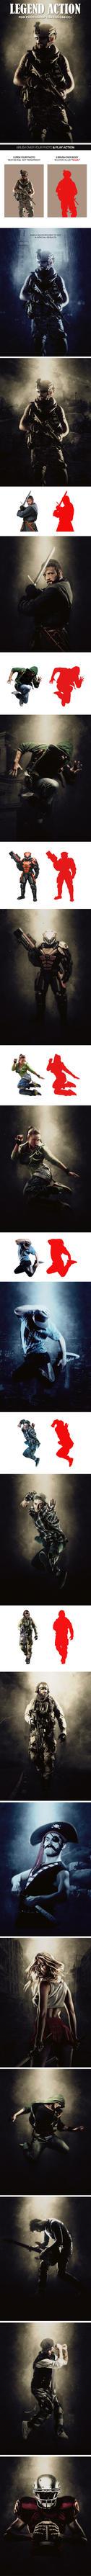 Legend Photoshop Action by hemalaya